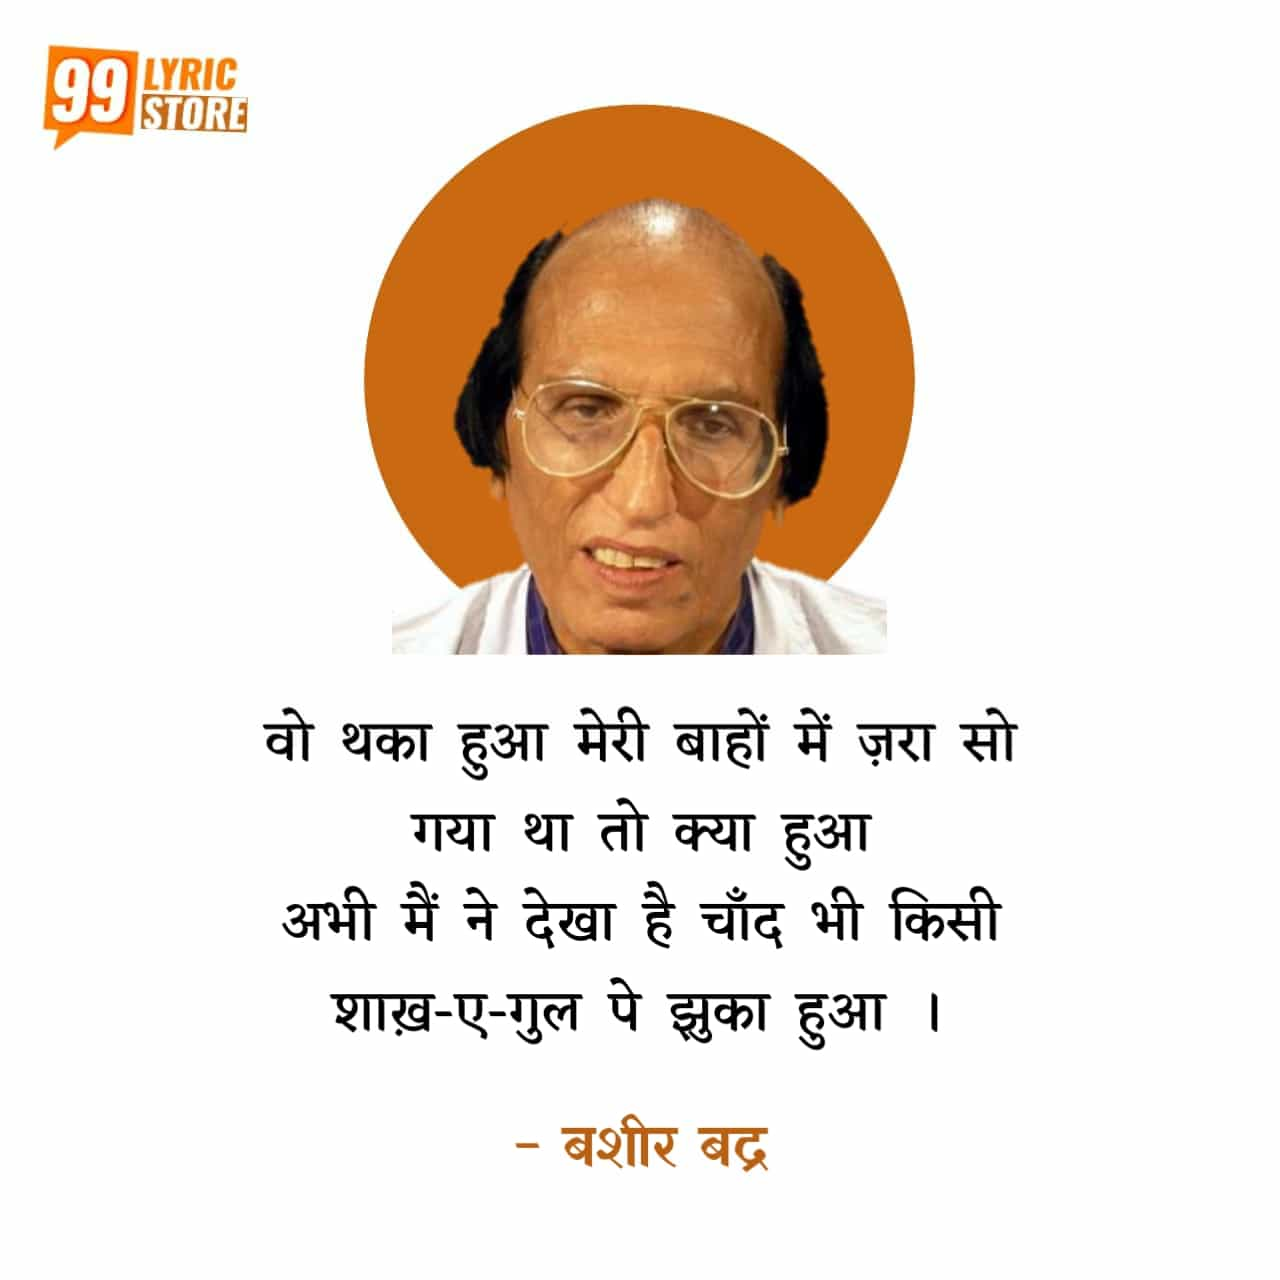 Wo Thaka Hua Meri Baahon Me Shayari has Written by Bashir Badr.